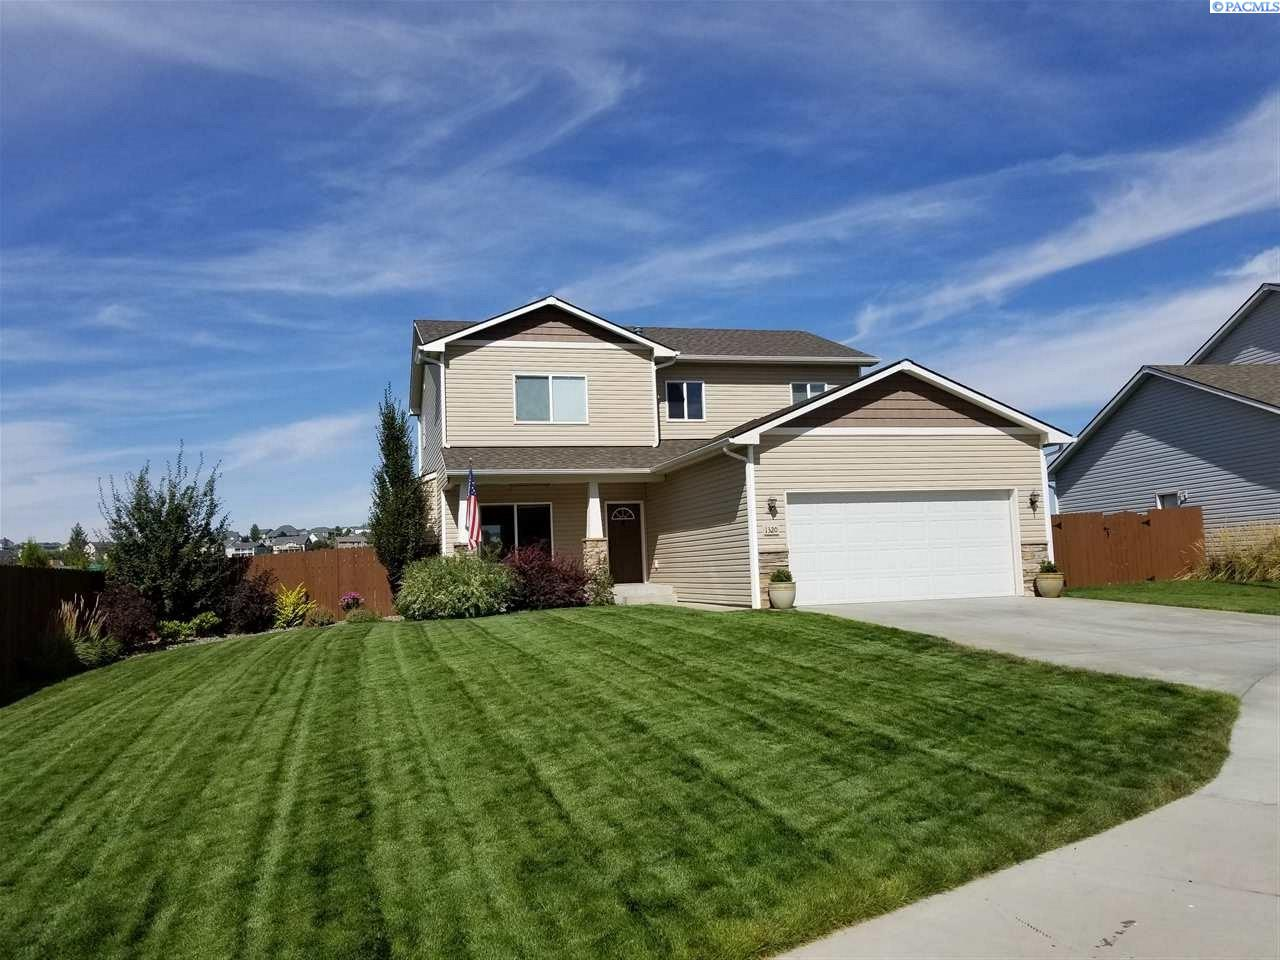 Single Family Home for Sale at 1320 SW Lehman 1320 SW Lehman Pullman, Washington 99163 United States